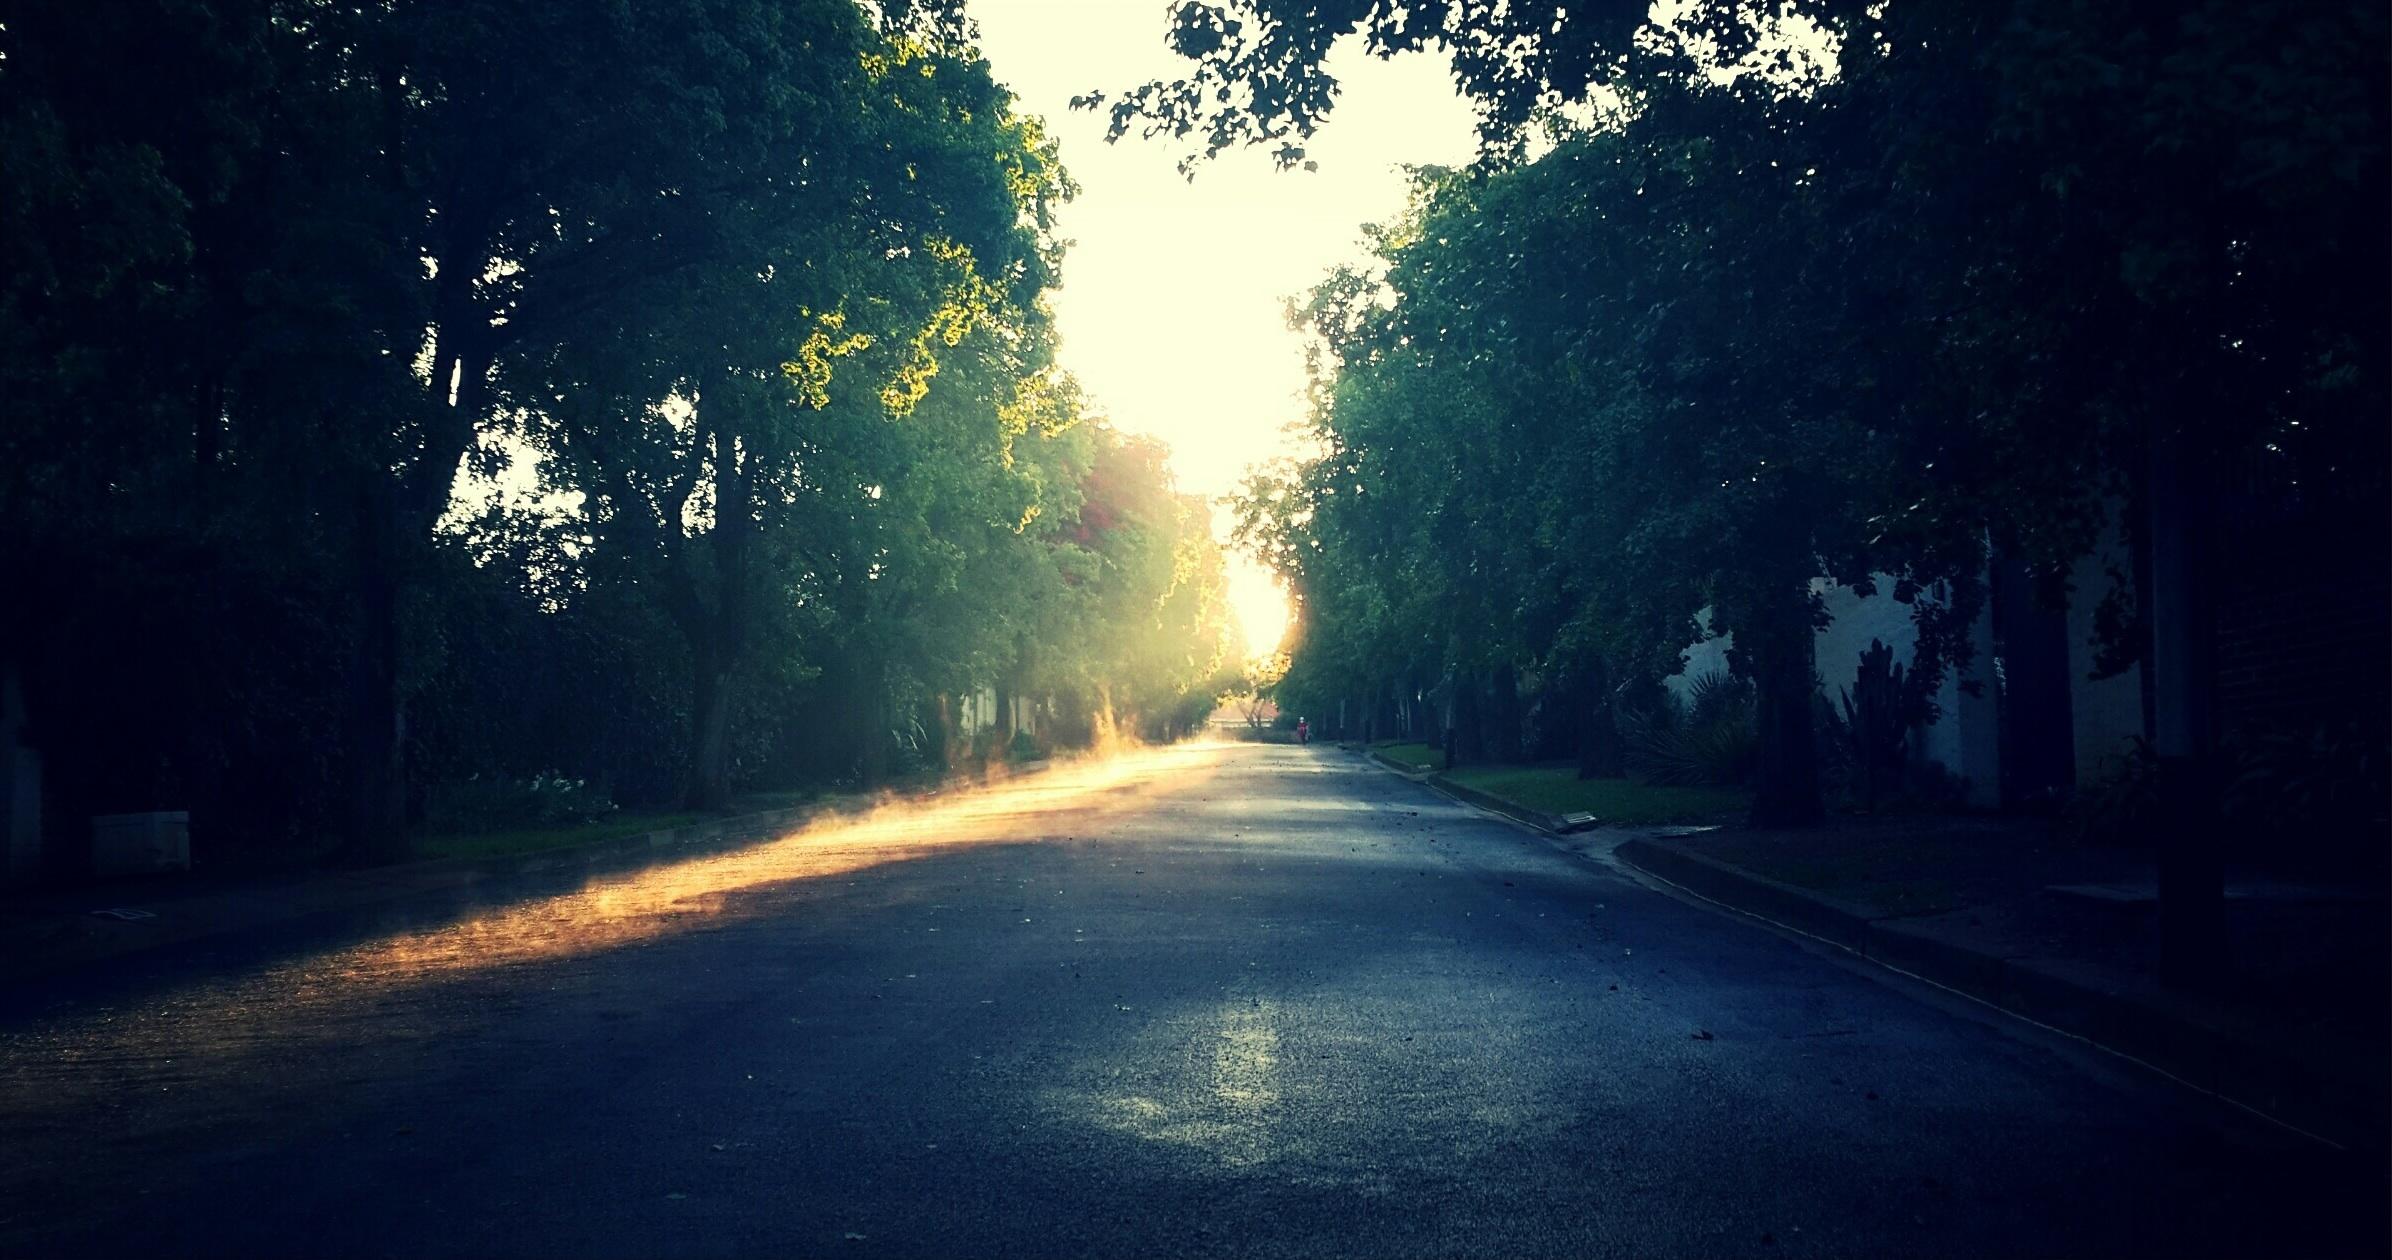 Shadowy Road, Tree, Wood, Woods, Shadow, HQ Photo